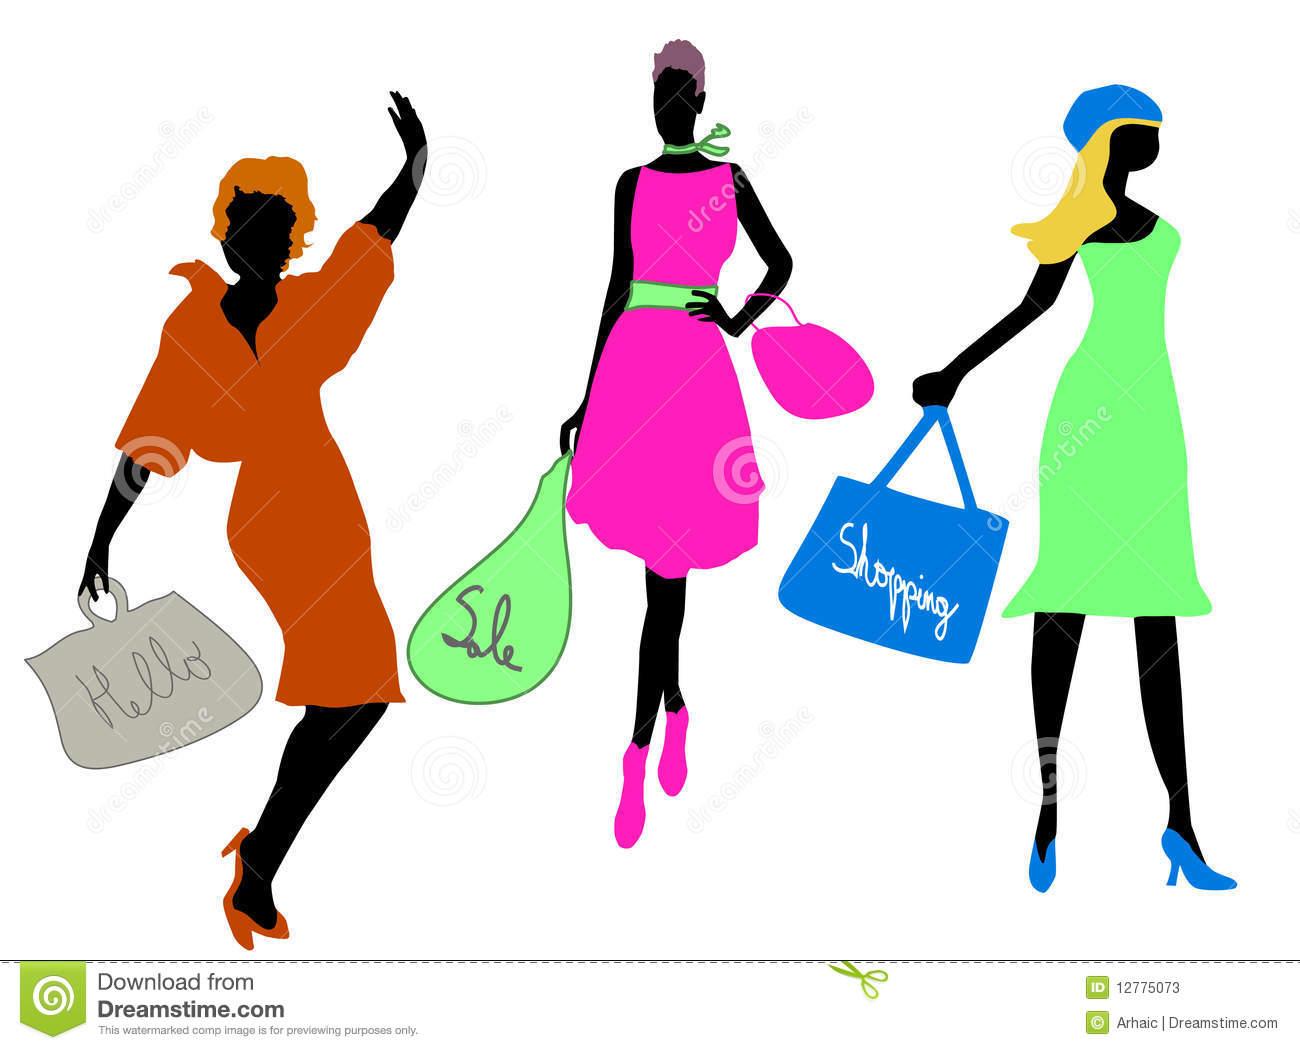 Clip art fashion show. show clipart